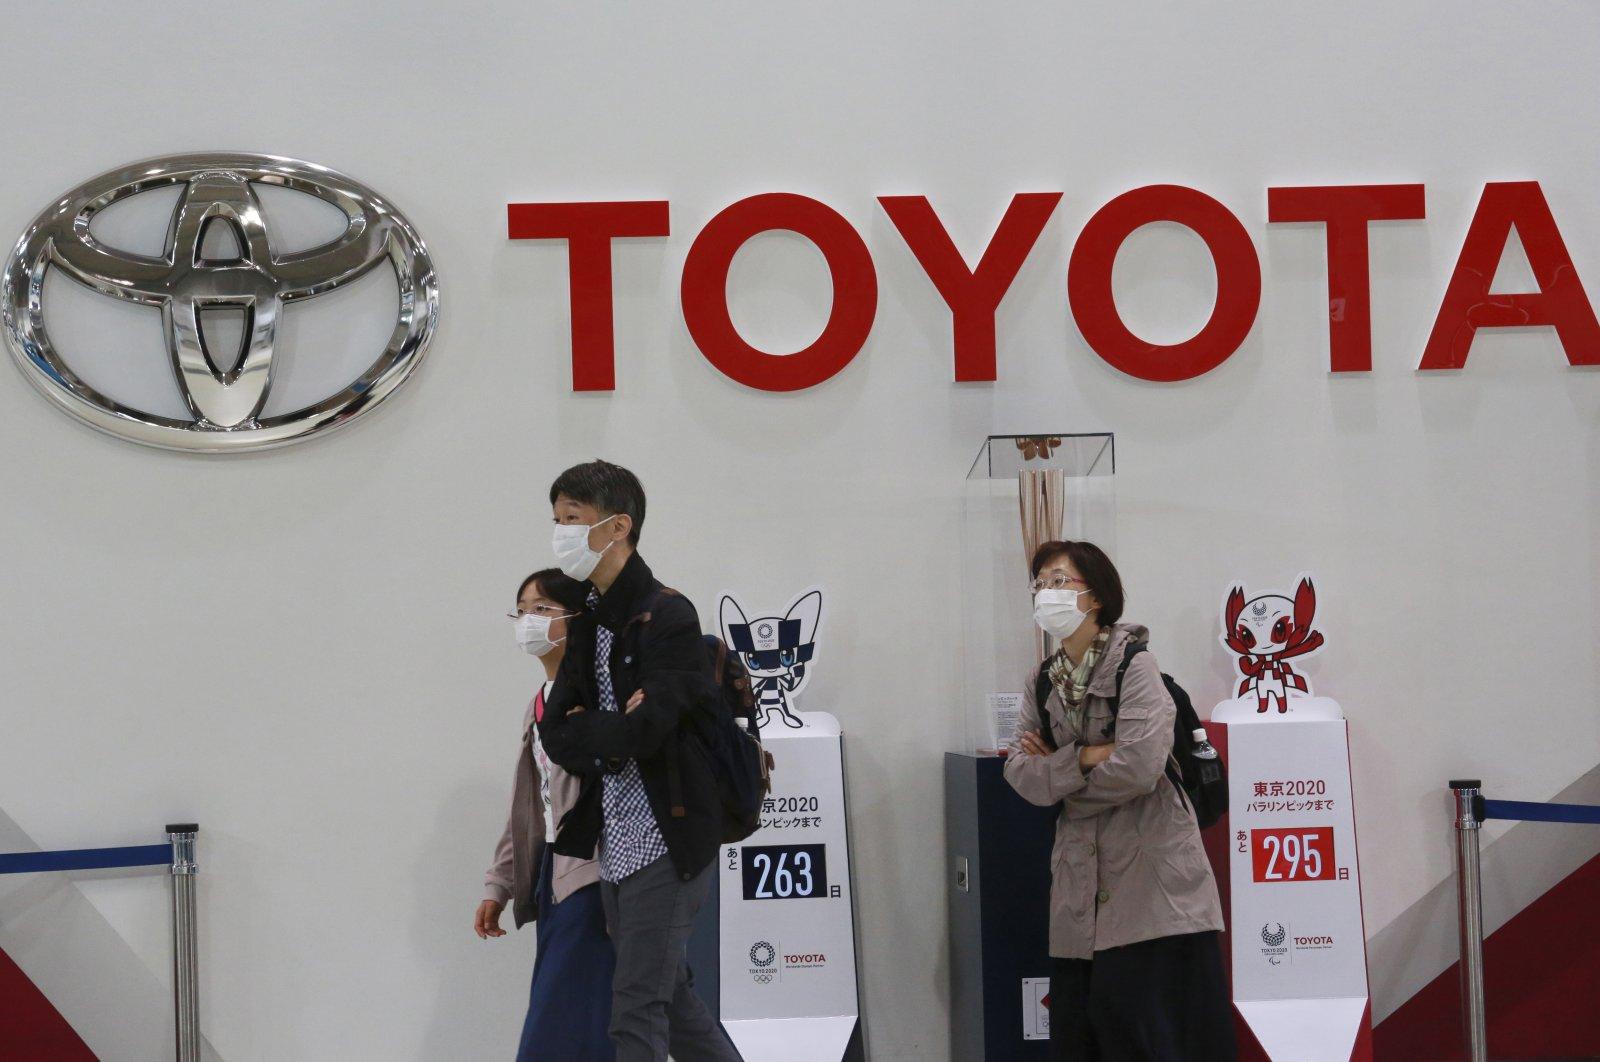 Visitors walk around a Toyota showroom in Tokyo, Japan, Nov. 2, 2020. (AP Photo)